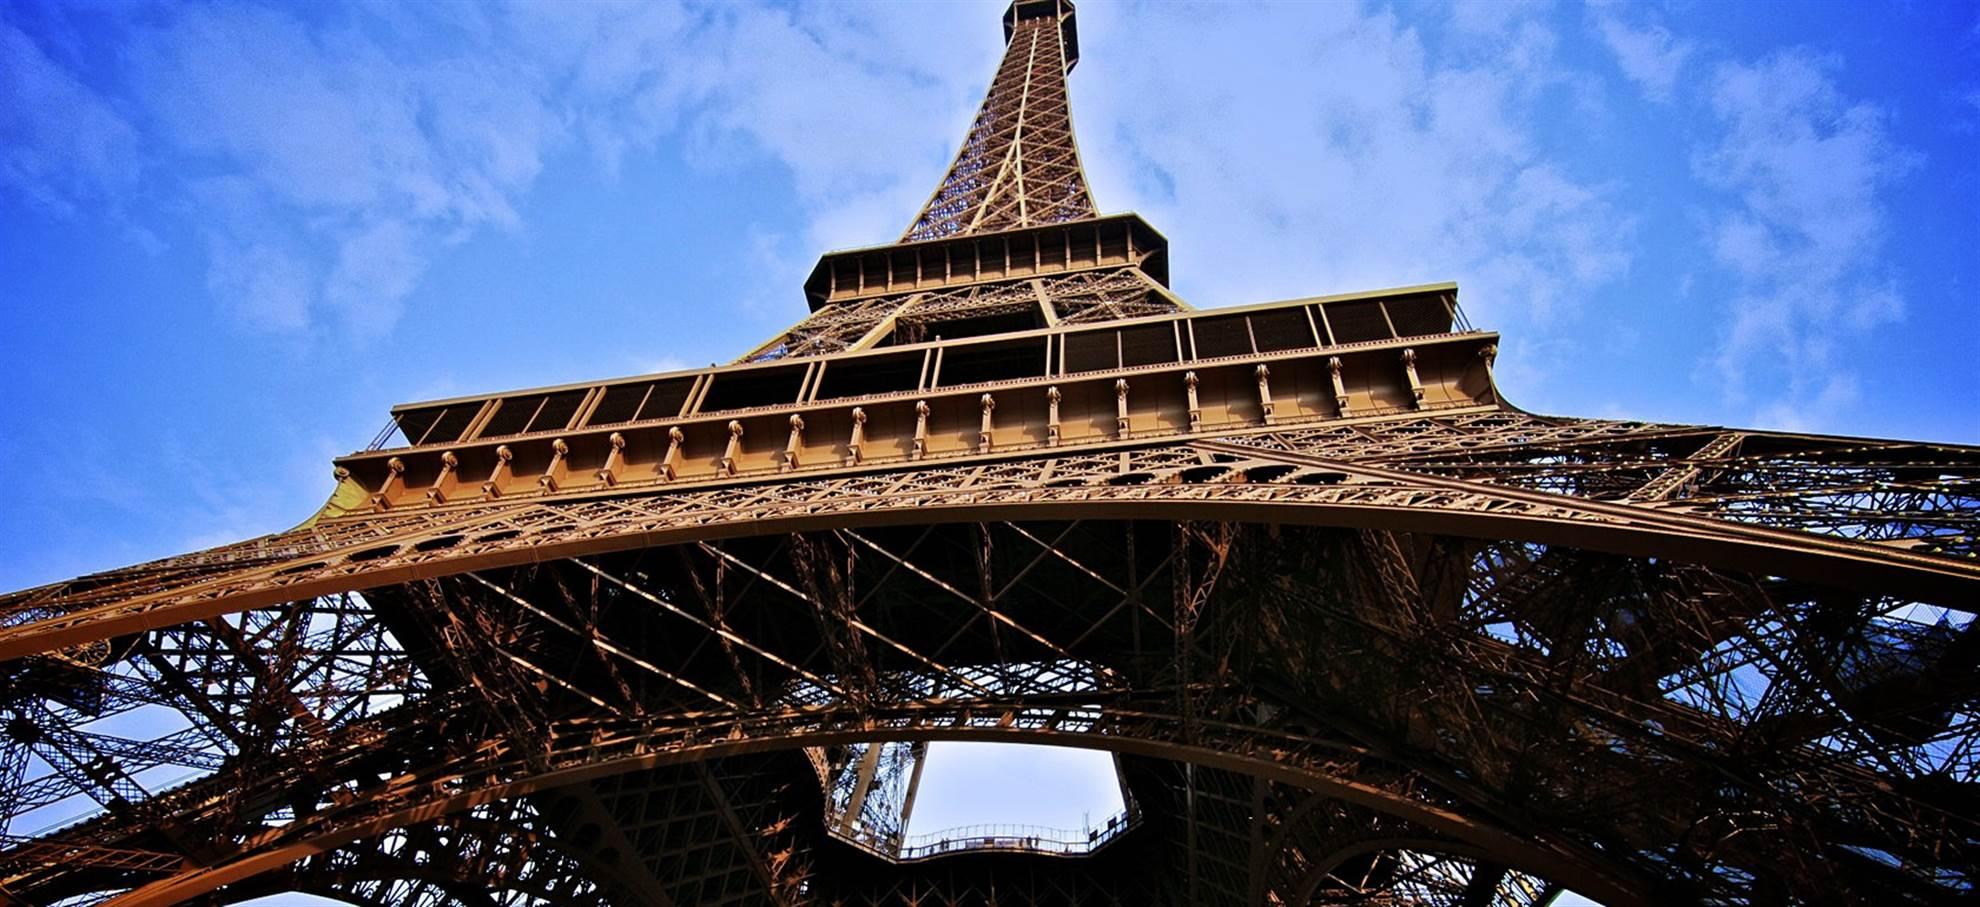 Rondleiding Eiffel Toren